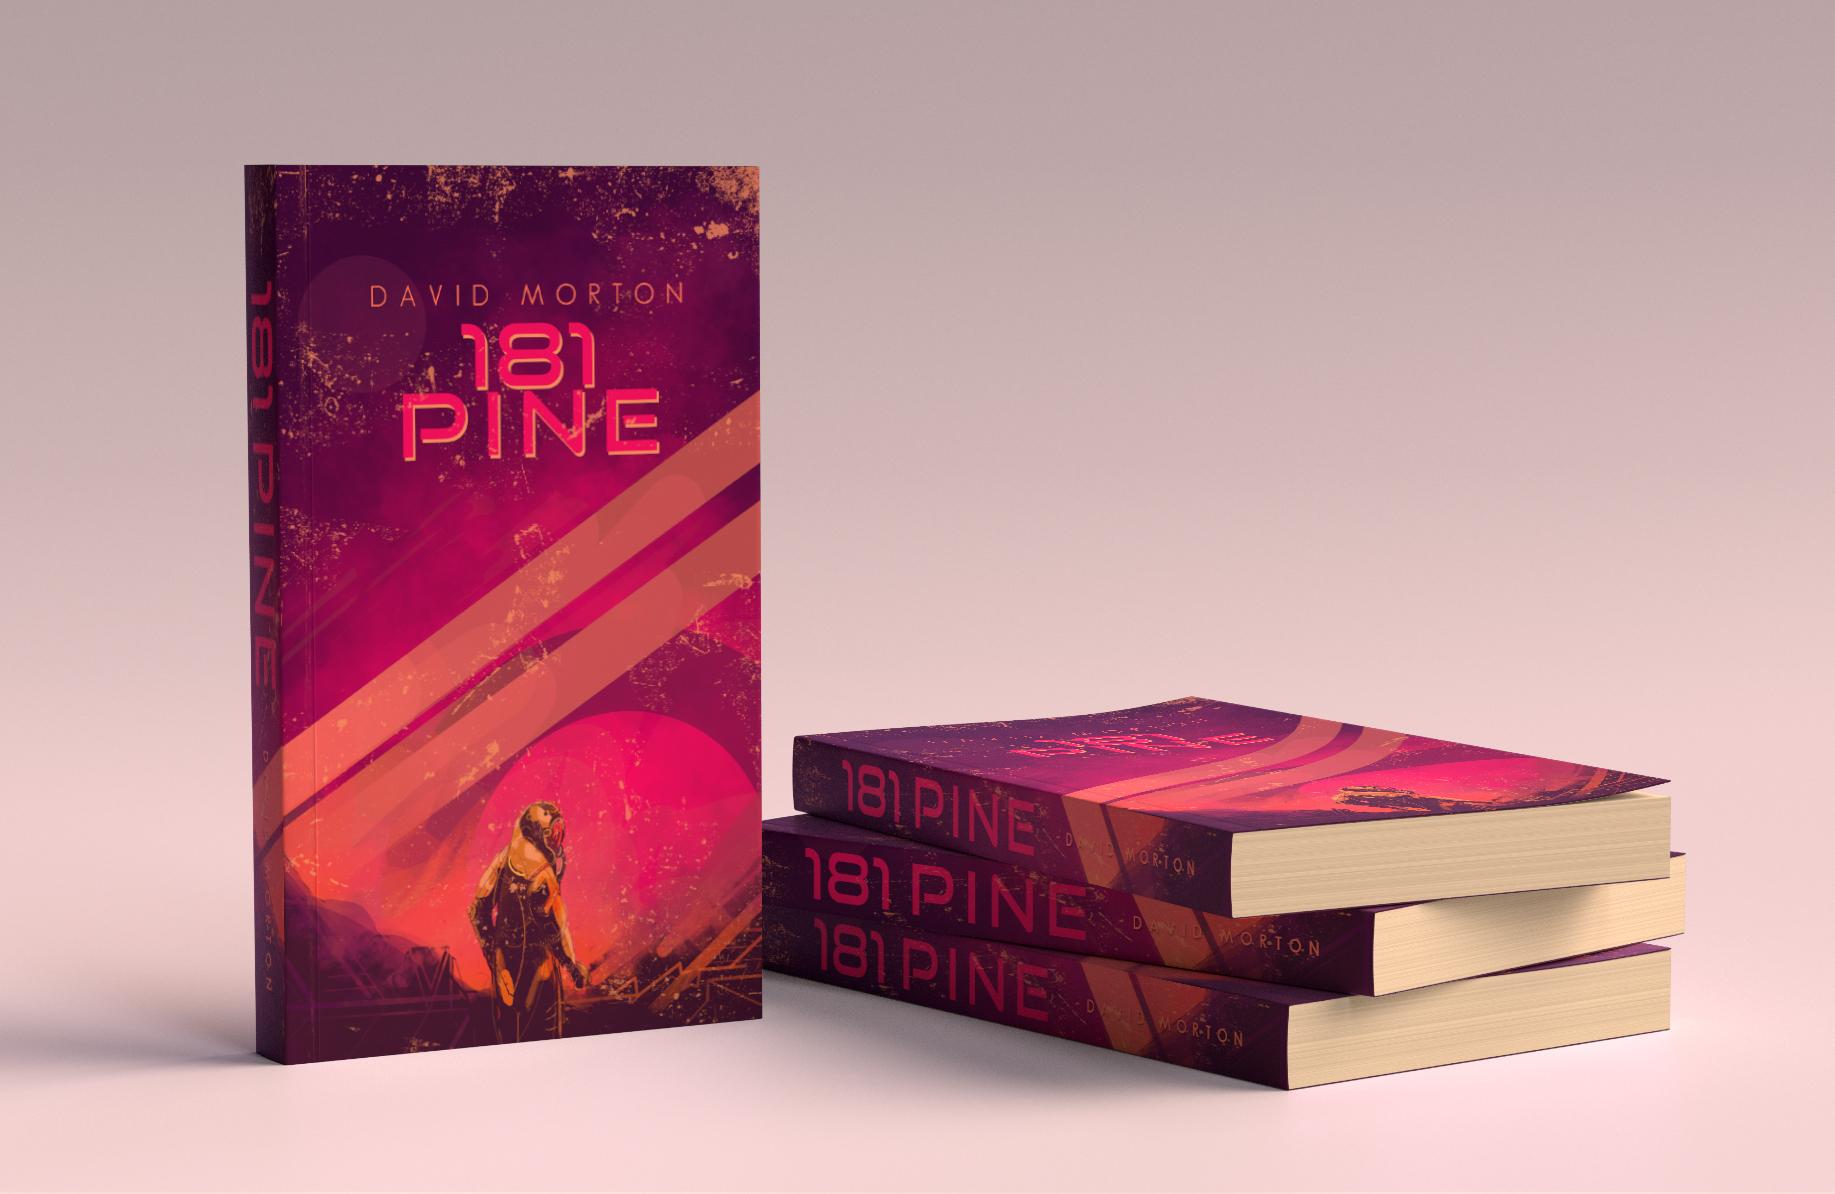 181 Pine Book Cover Mockup 1